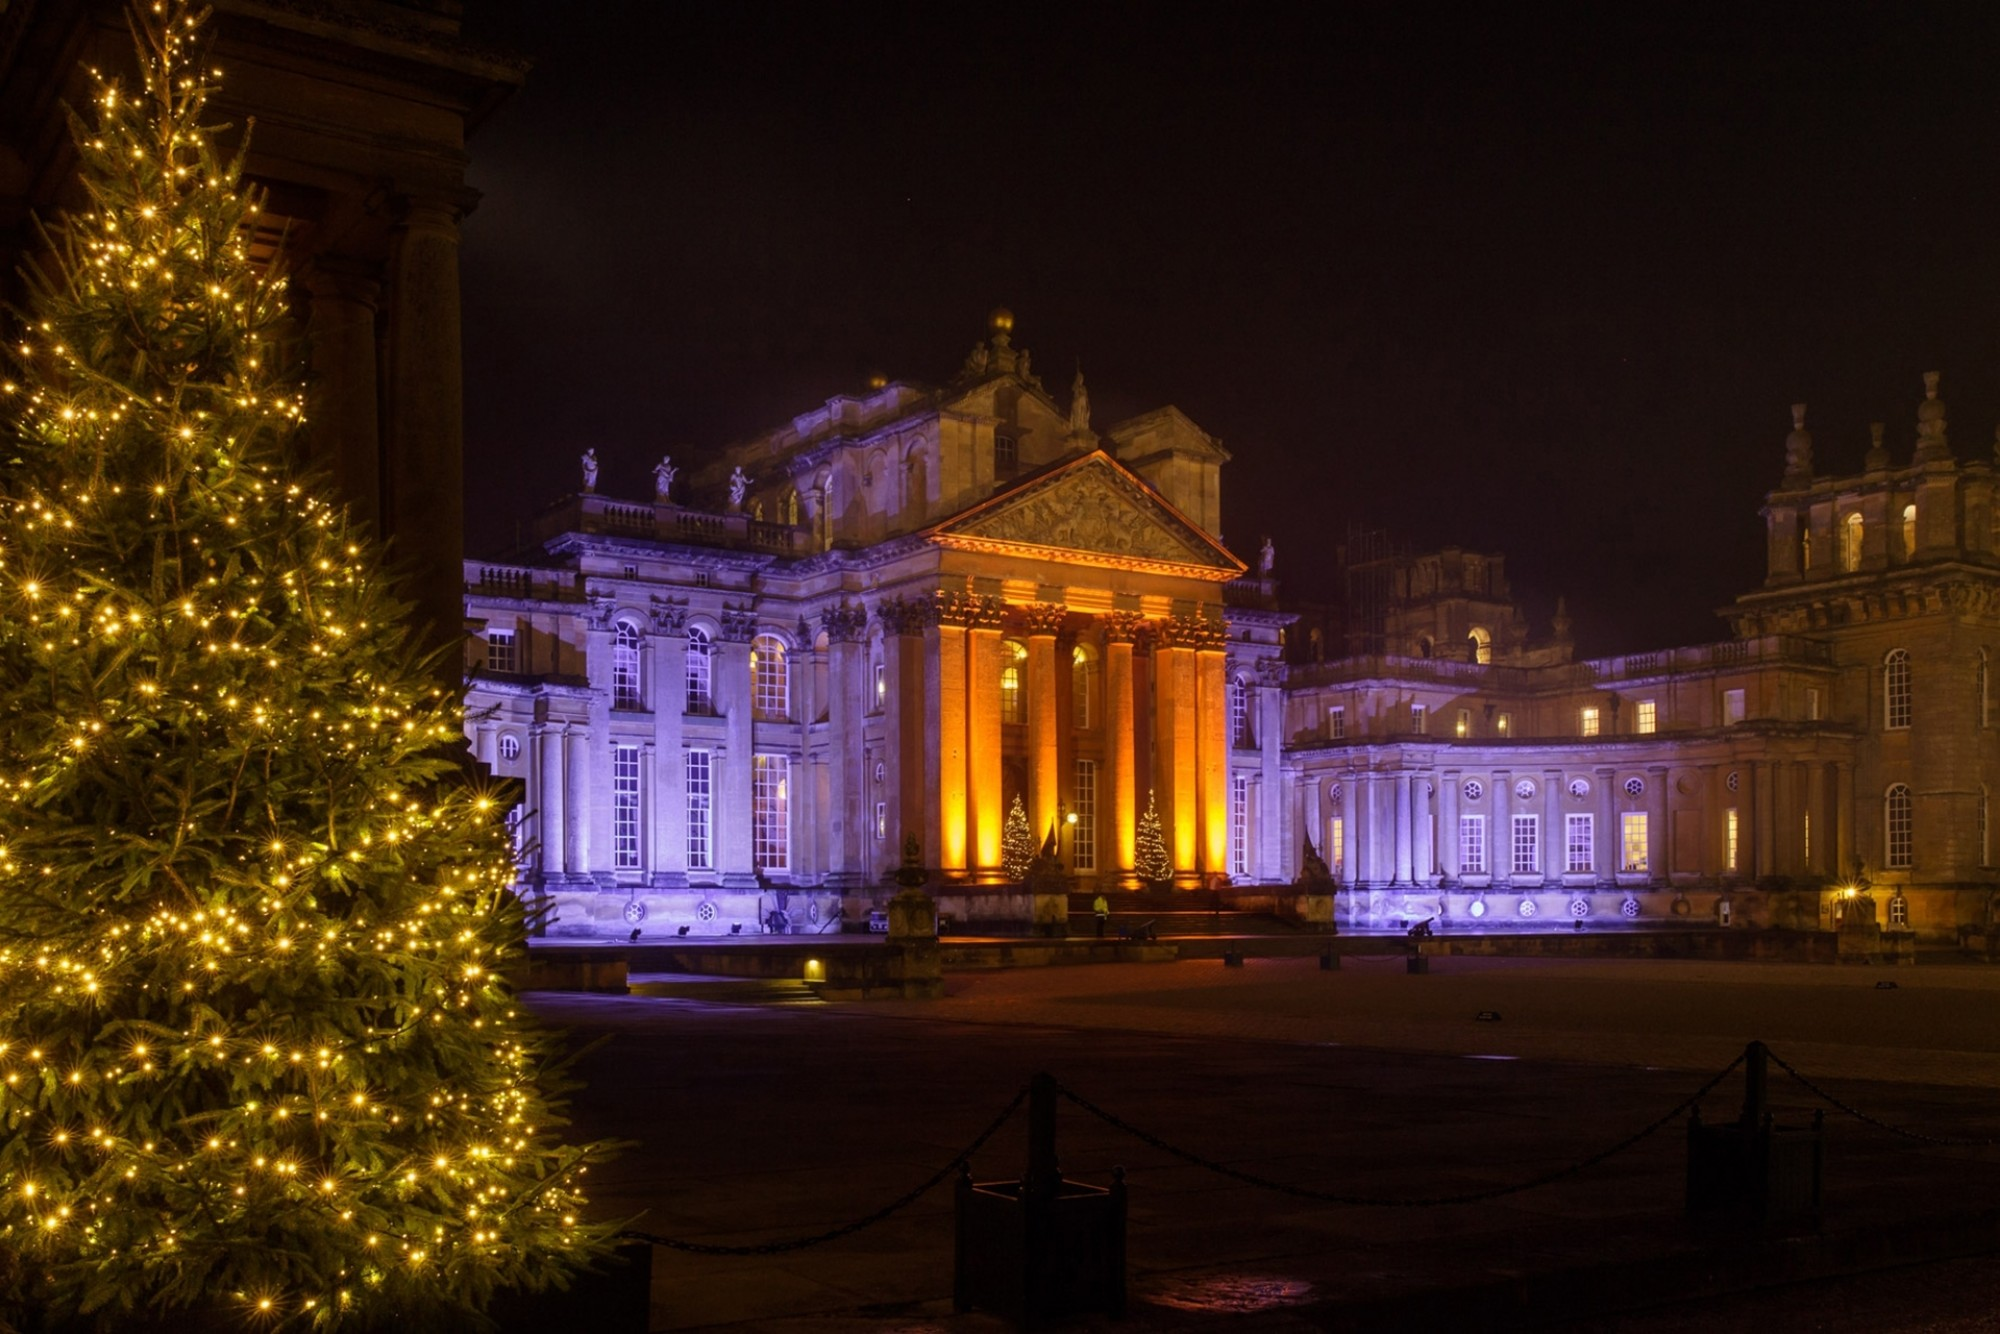 Blenheim Palace Christmas Lights Courtyard